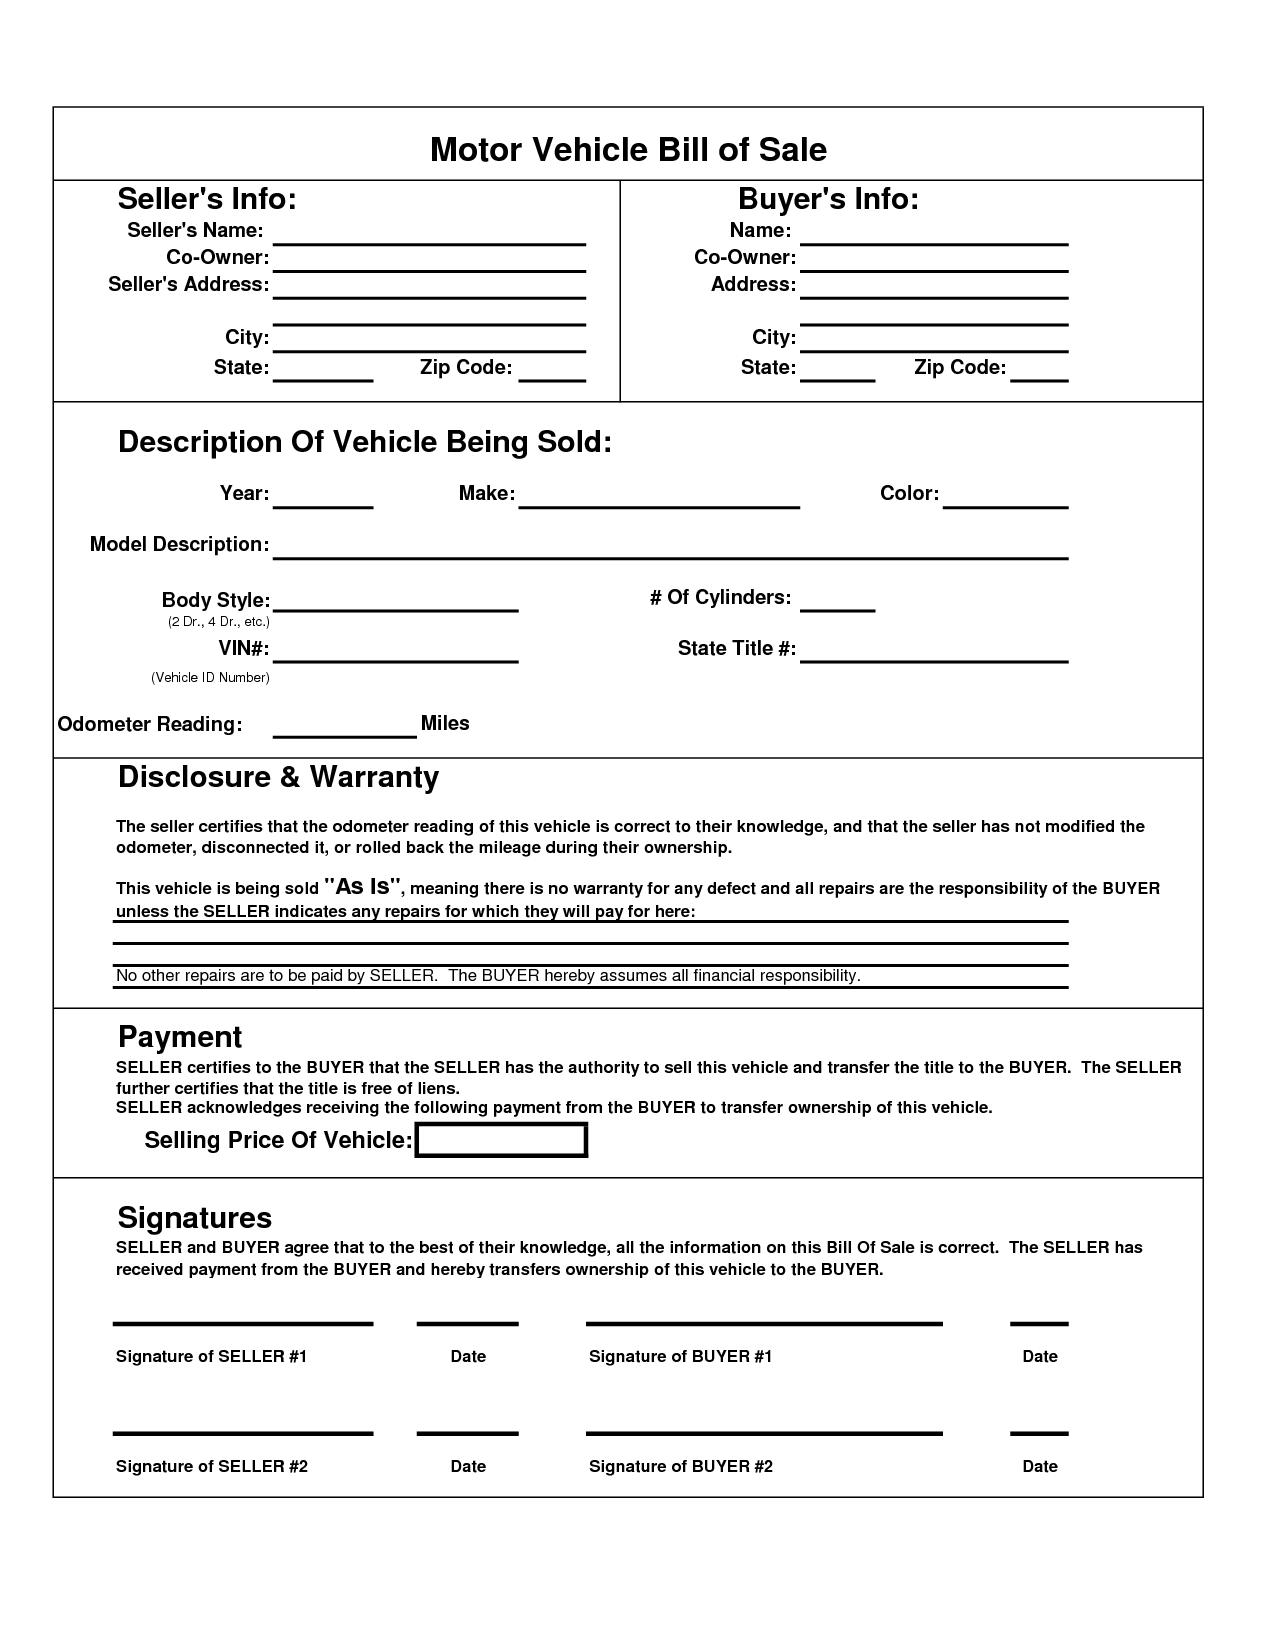 Printable Car Bill Of Sale Pdf | Bill Of Sale For Motor Vehicle - Free Printable Bill Of Sale For Car